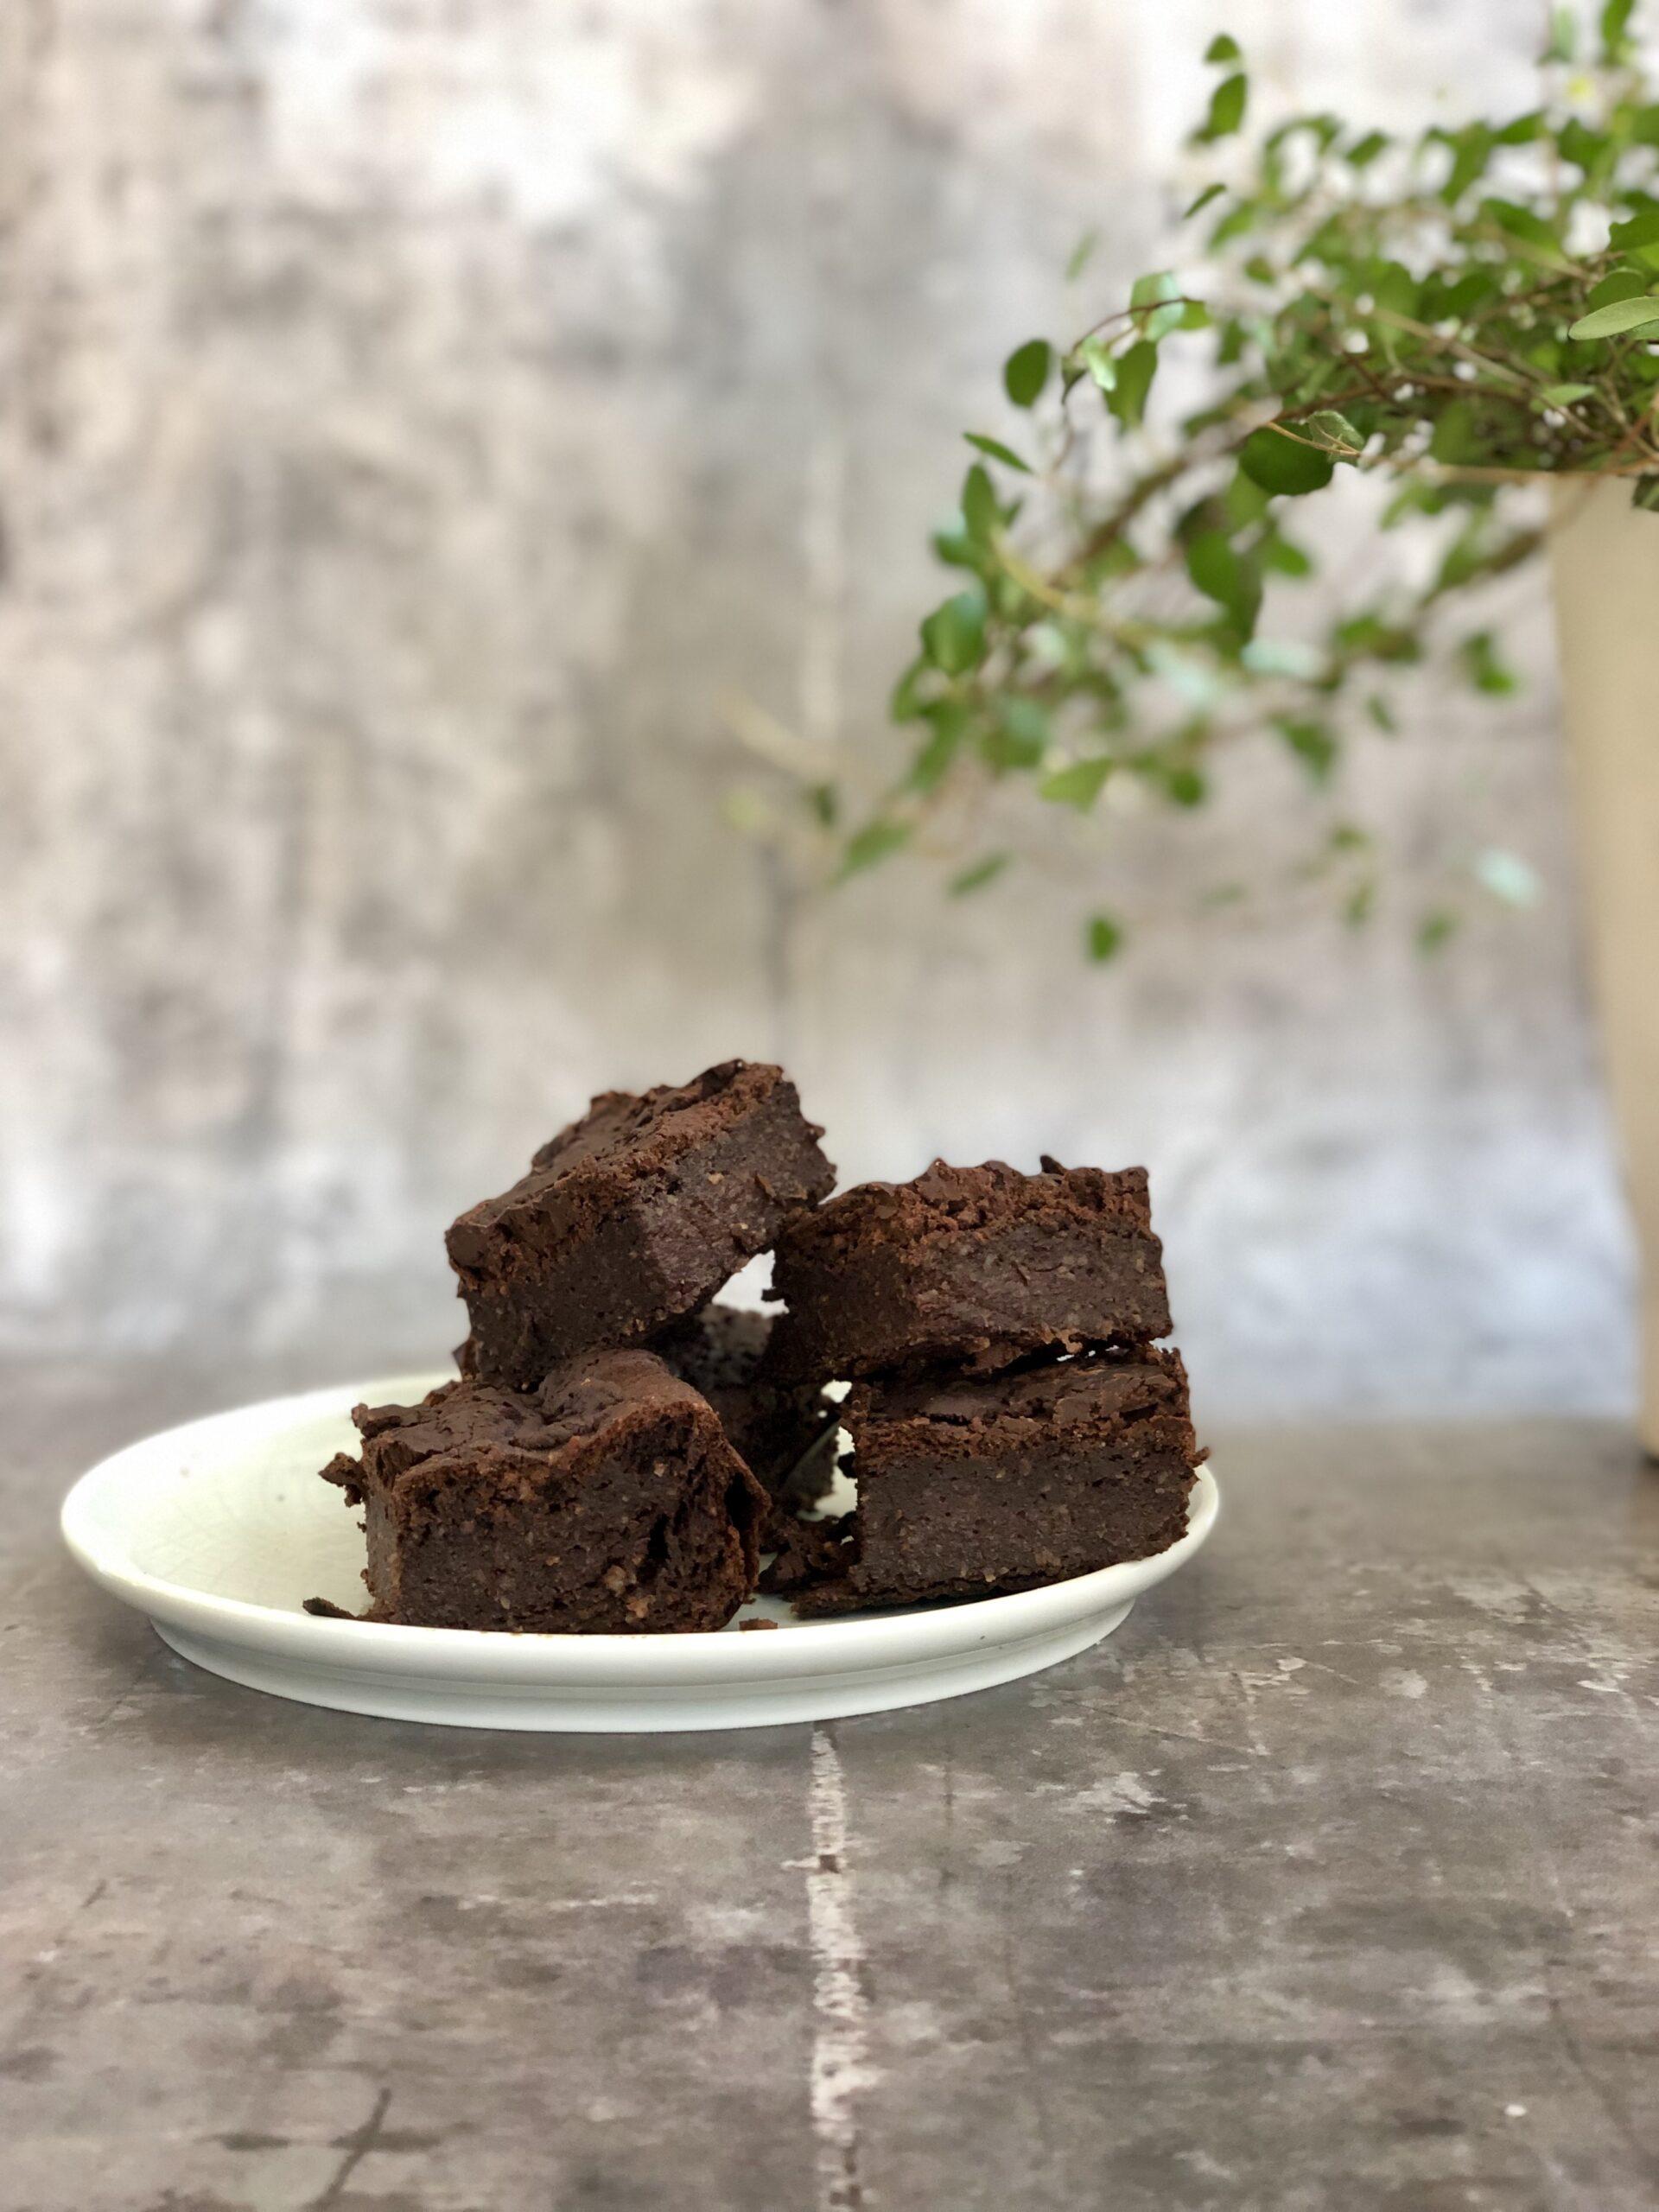 Den sunde chokoladekage